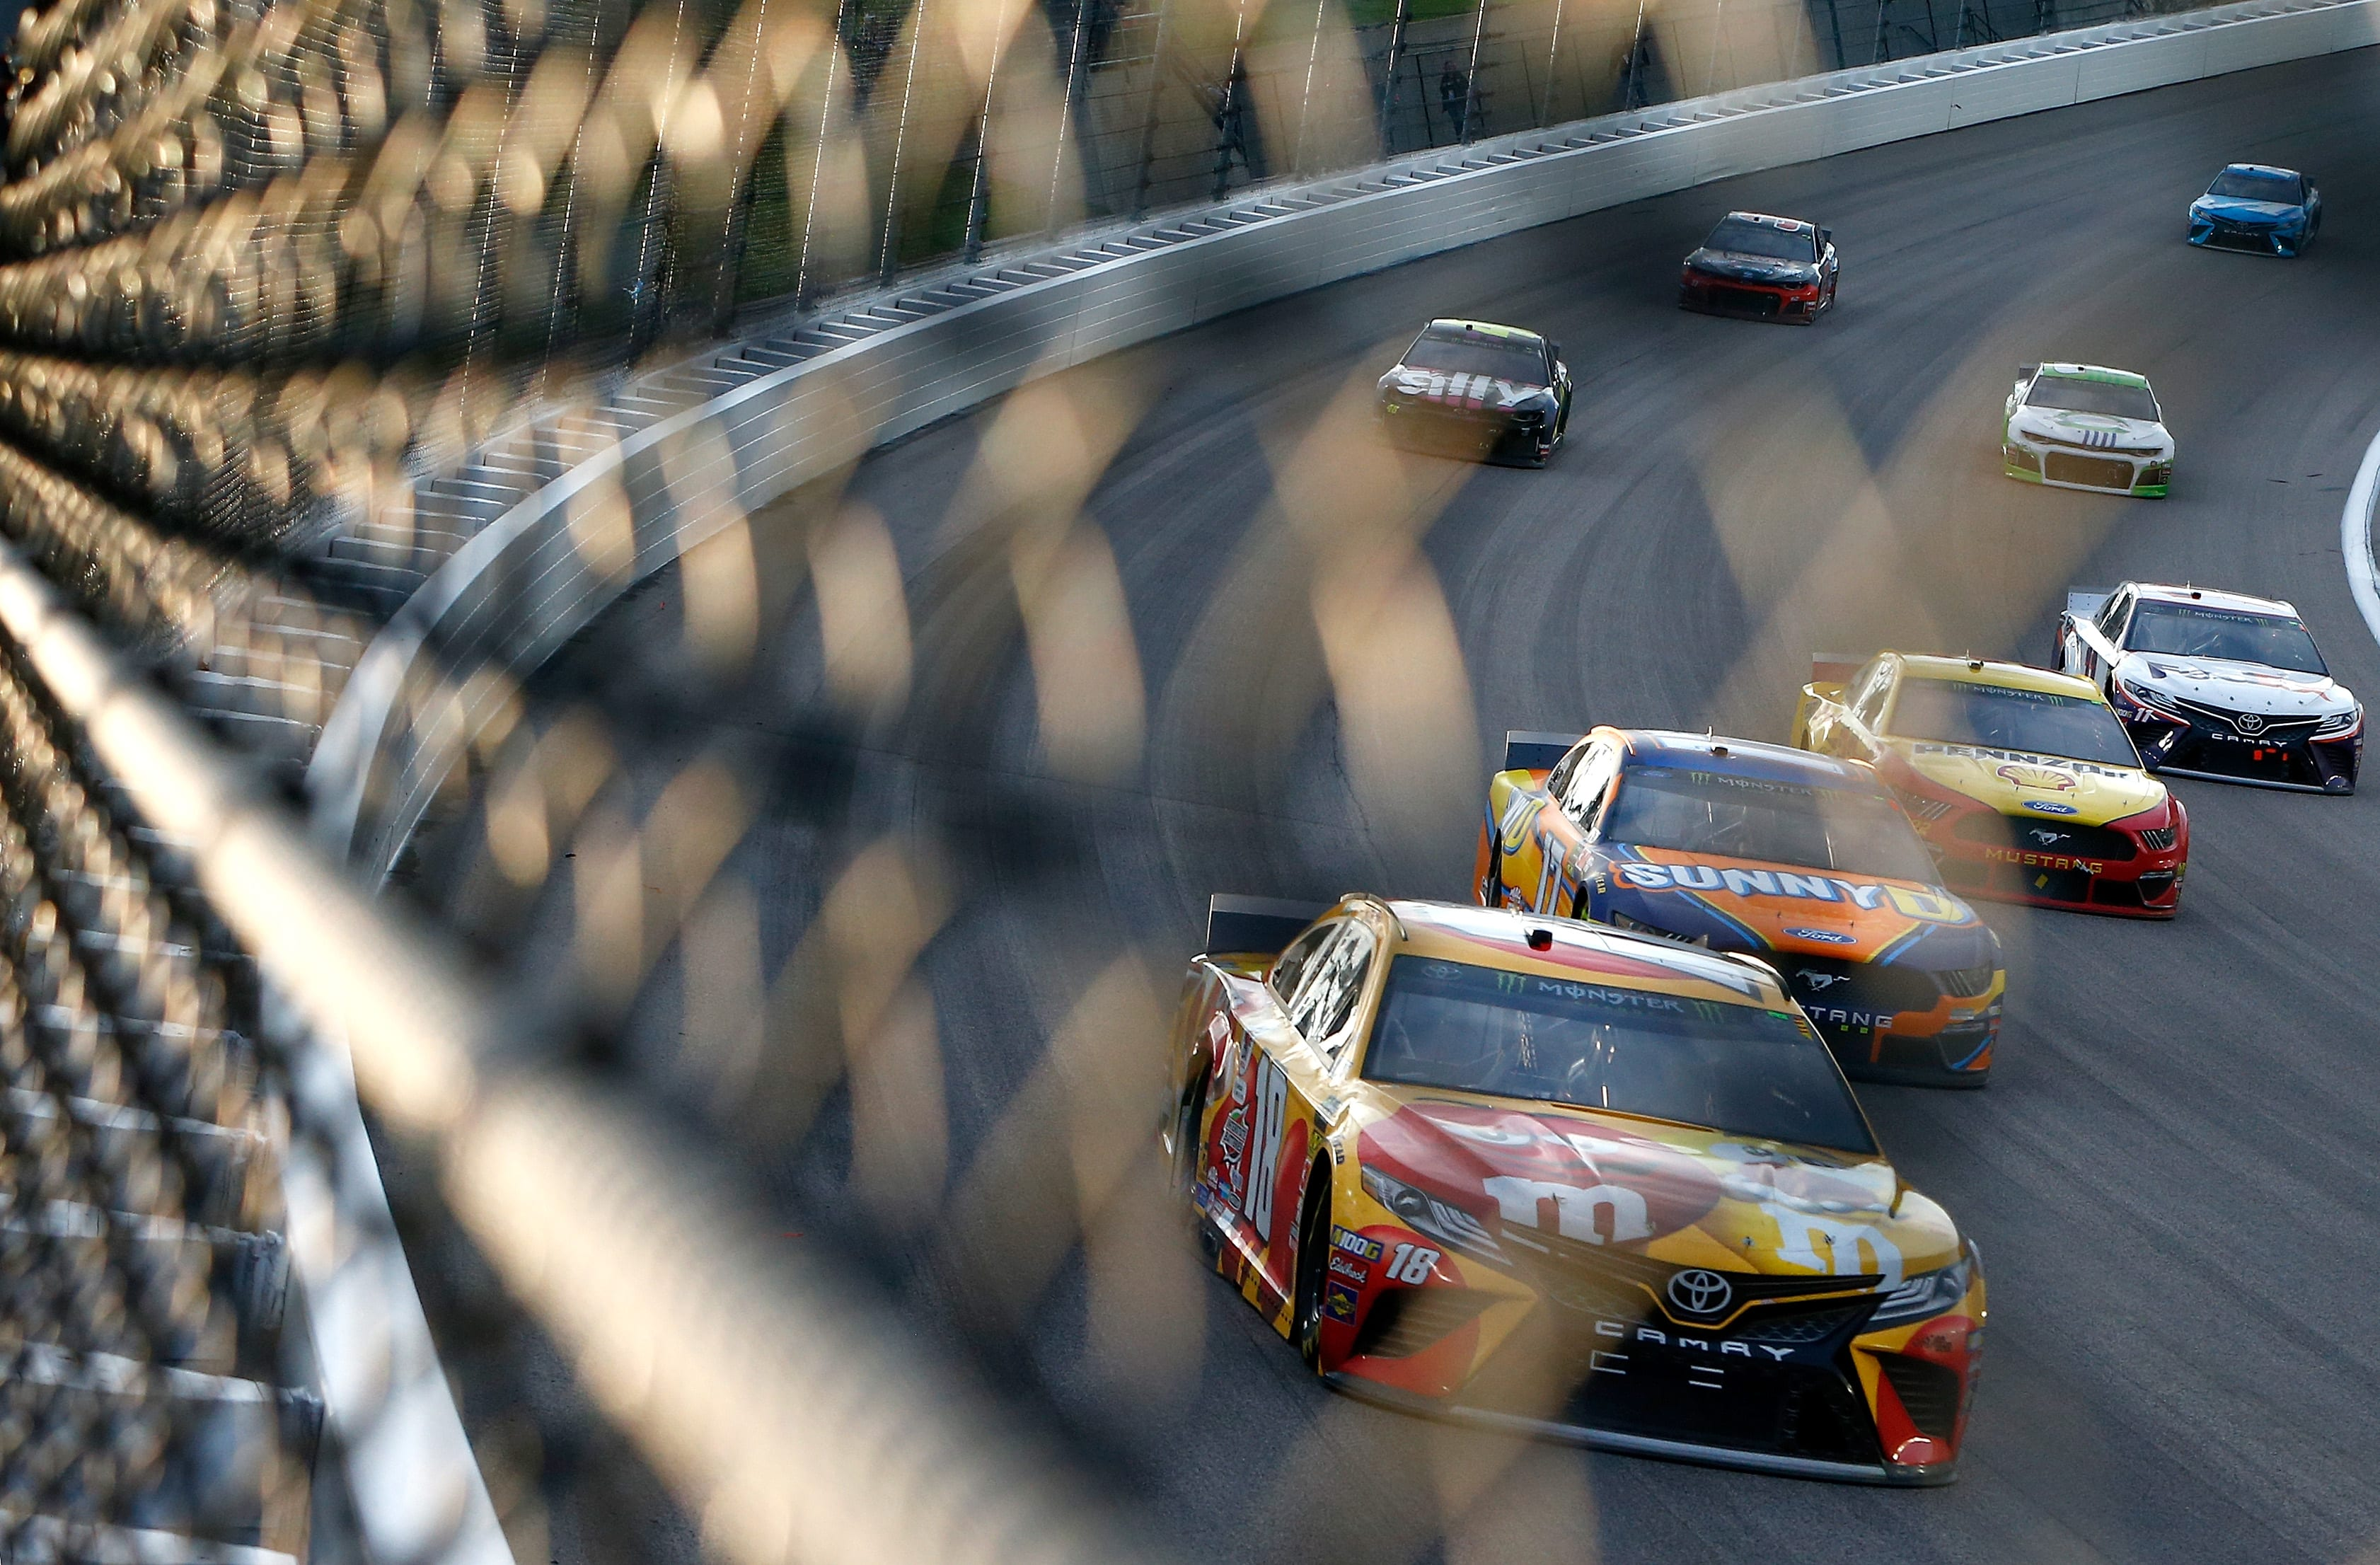 Kyle Busch, Ricky Stenhouse Jr, Joey Logano and Denny Hamlin at Kansas Speedway - NASCAR